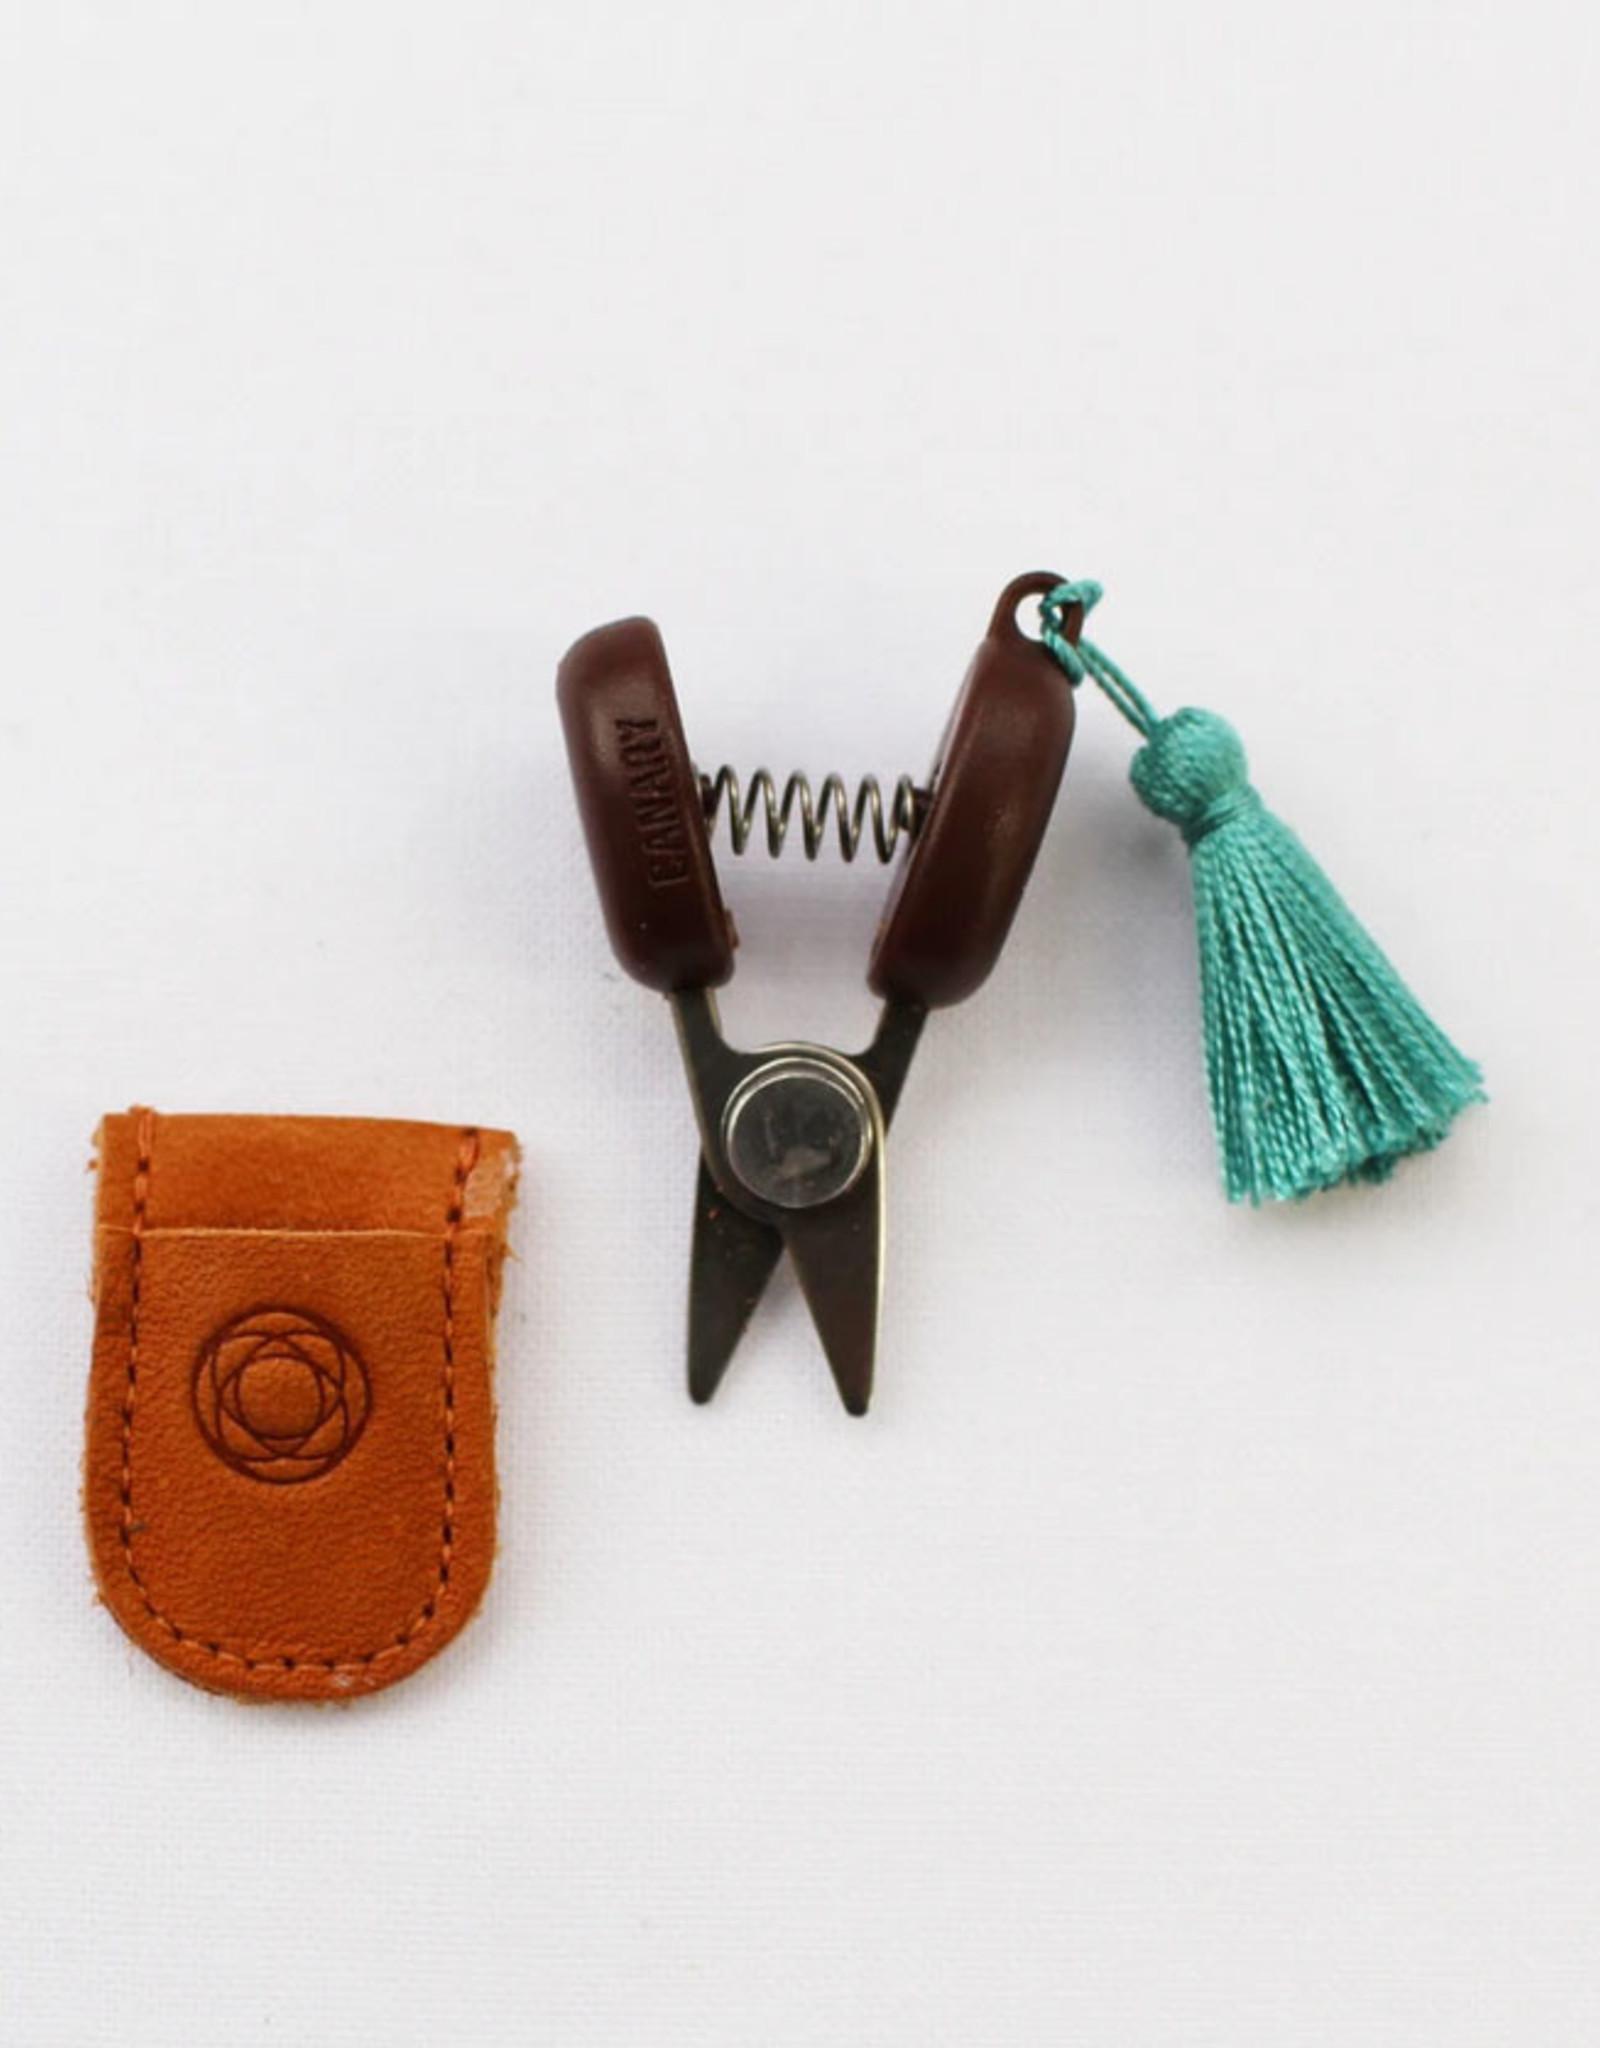 Cohana Mini Scissors of Seki